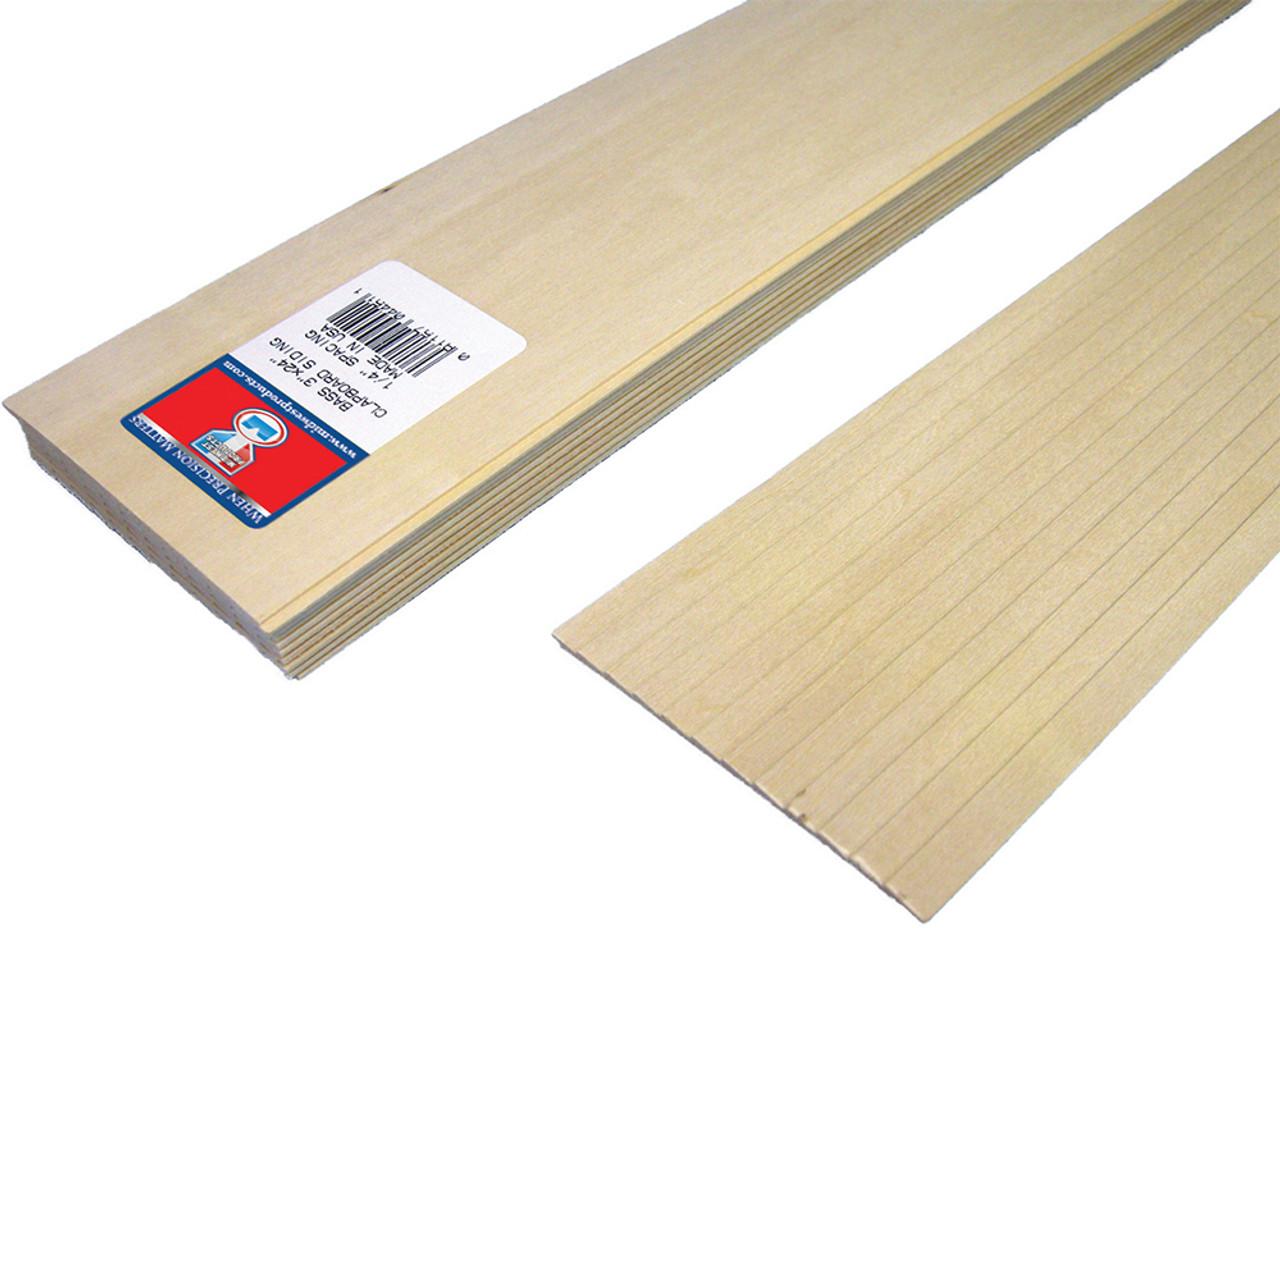 "Basswood Clapboard Siding 3"" x 1/4"" x 24"""